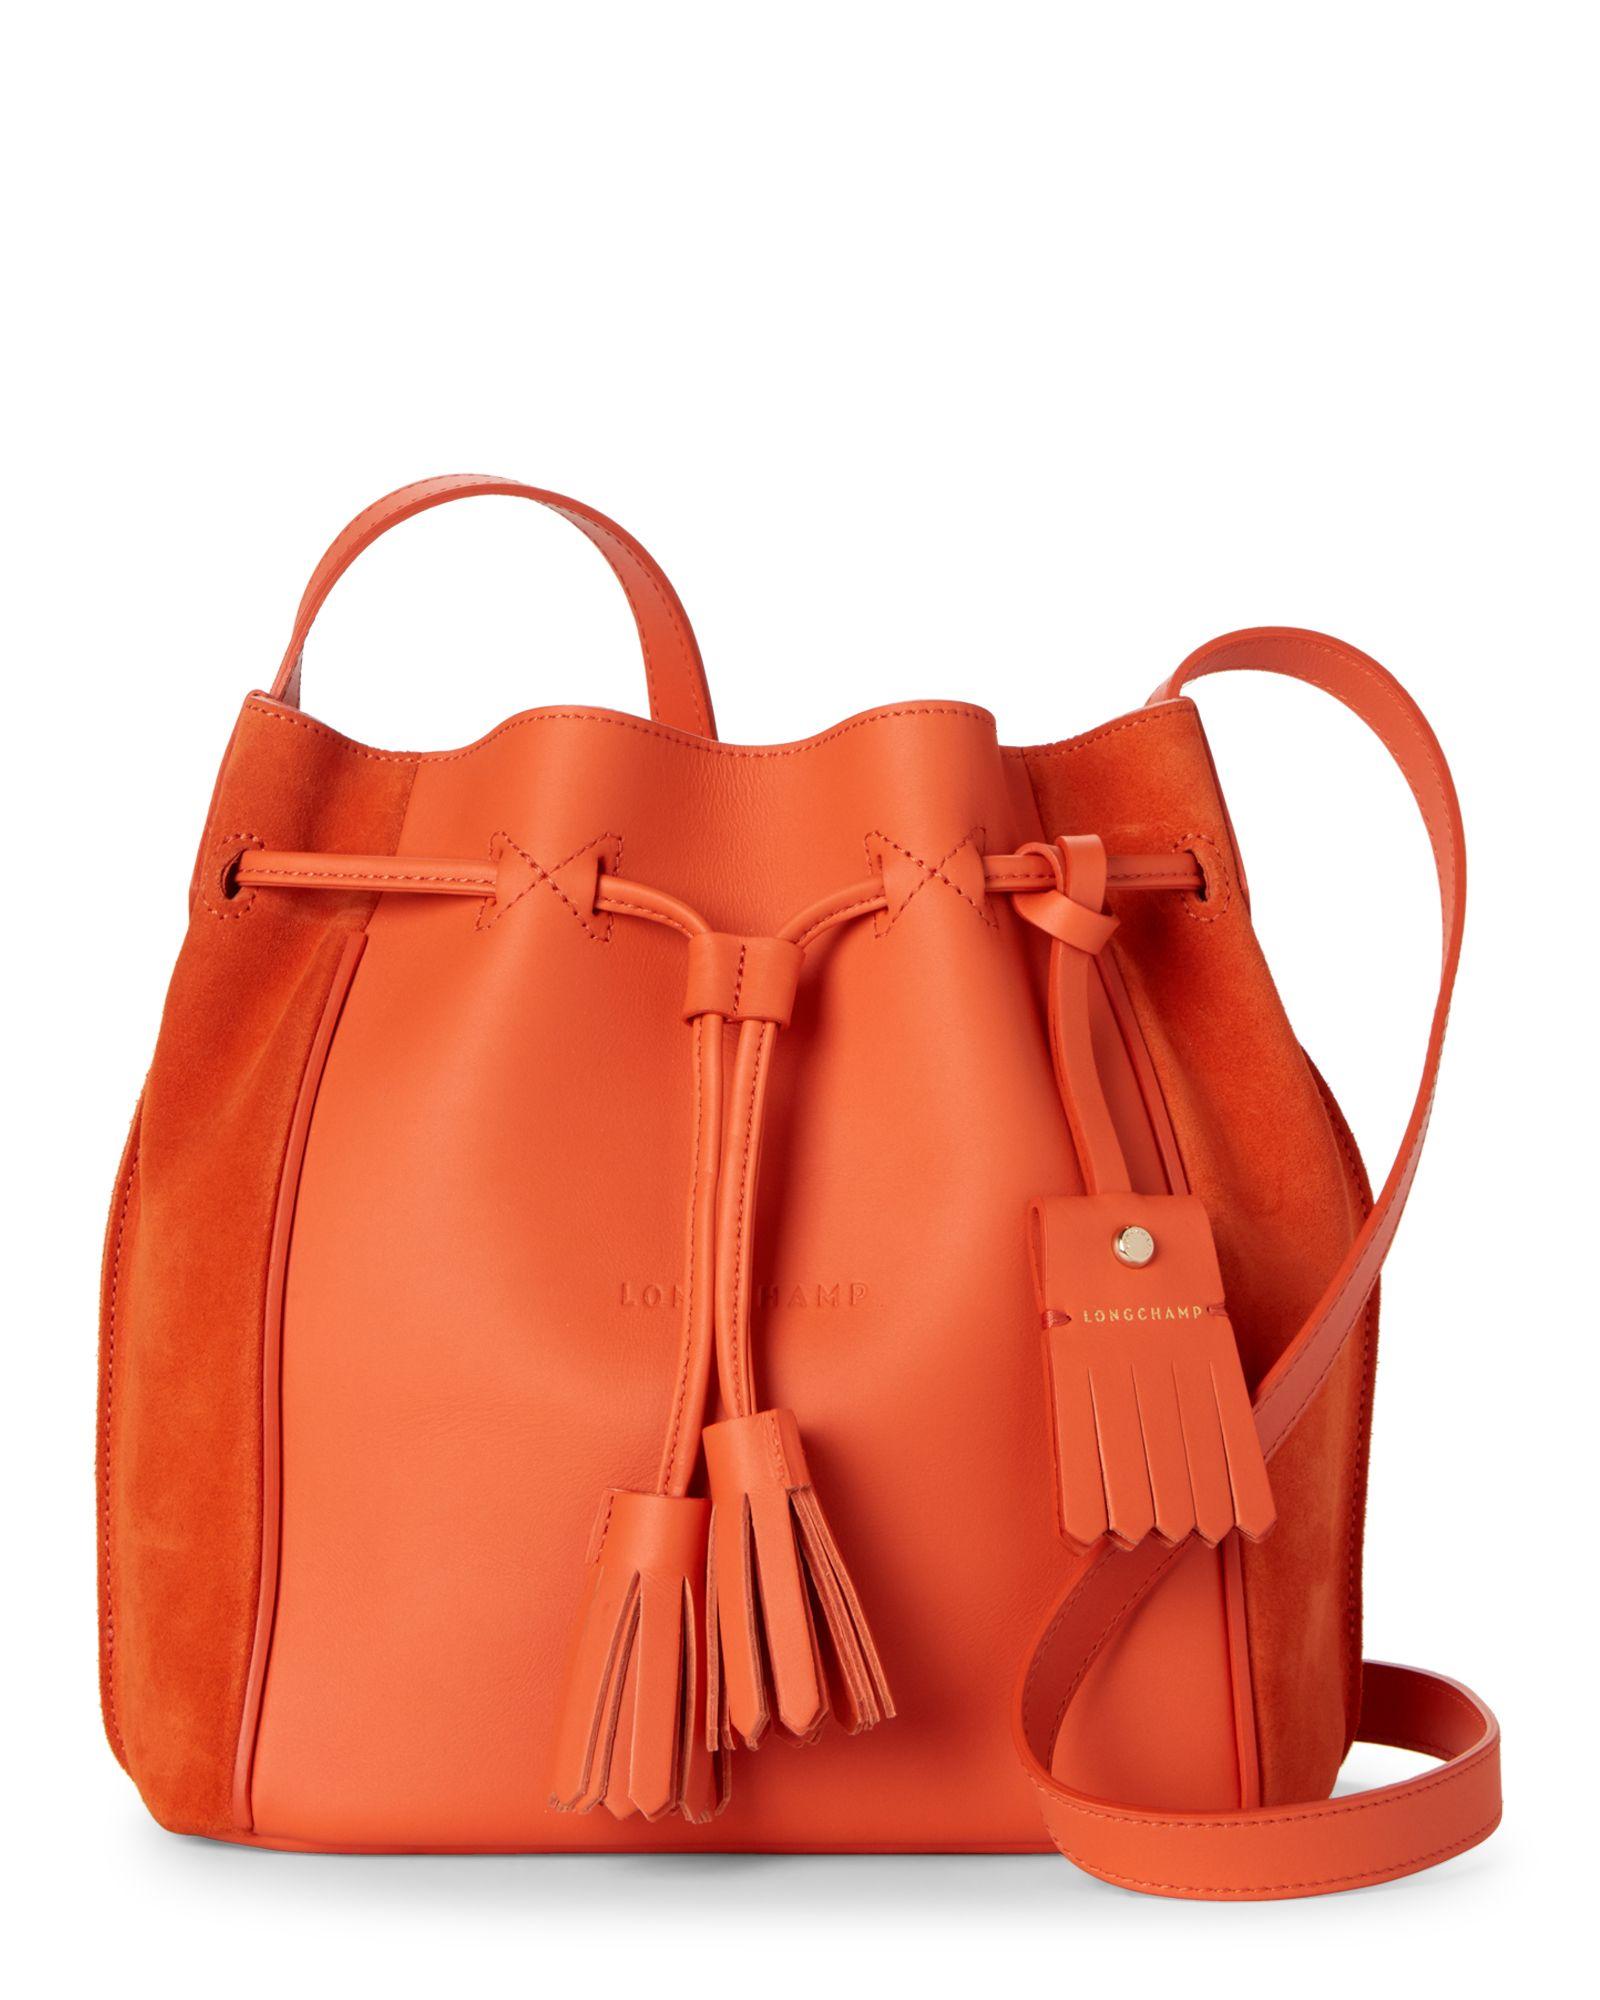 Longchamp Orange Penelope Fantaisie Bucket Bag | Bucket bag, Bags ...